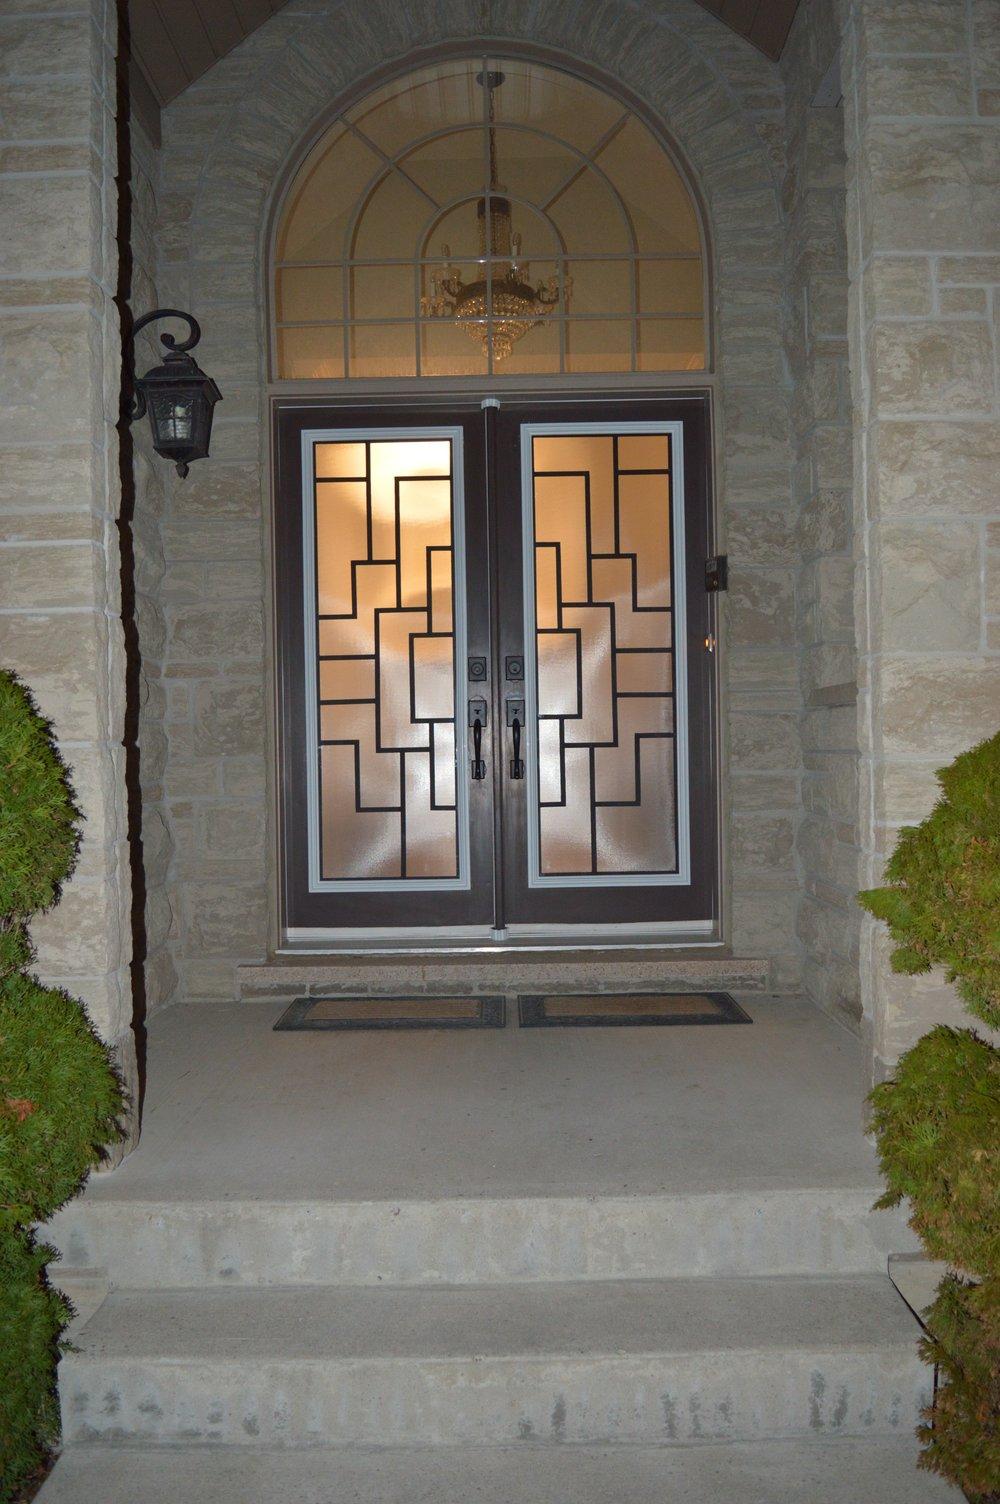 Malibu-Wrrought-Iron-Glass-Door-Inserts-Mississauga-Ontario